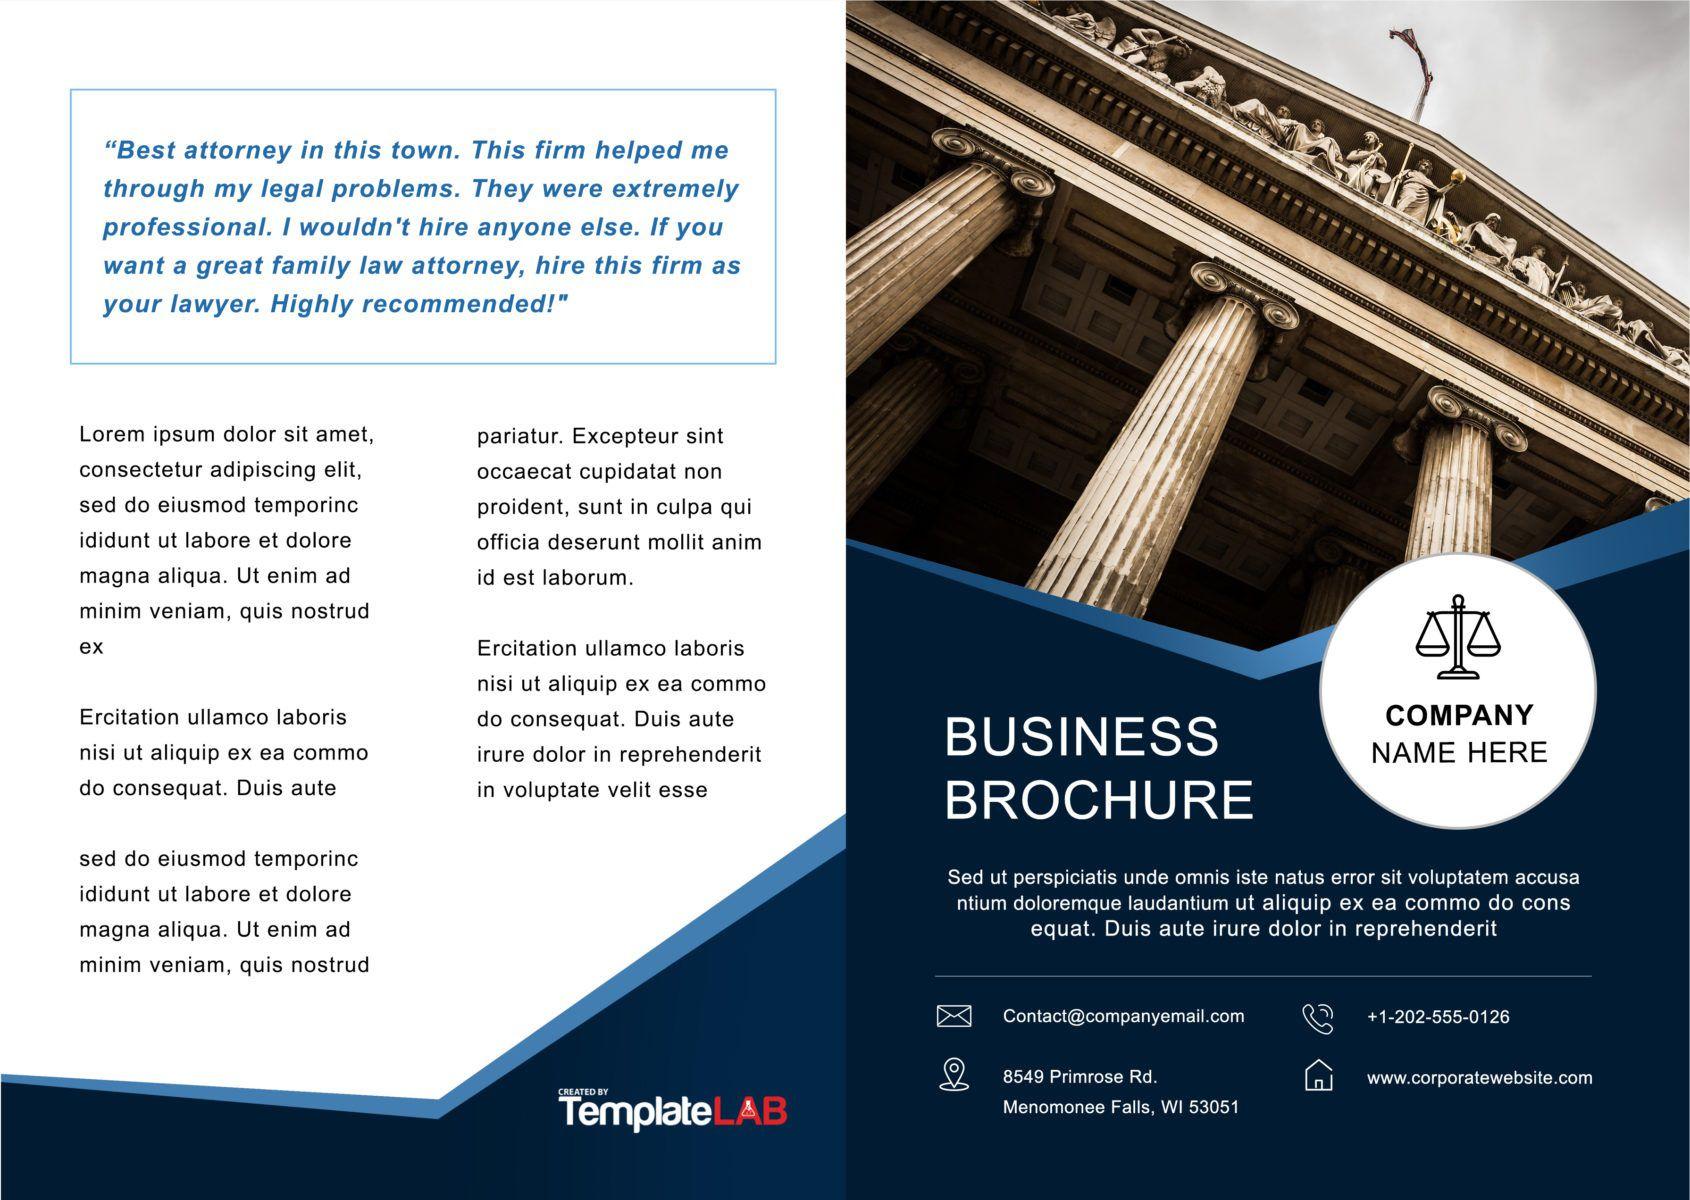 000 Stupendou Free Online Brochure Template For Word Inspiration  MicrosoftFull